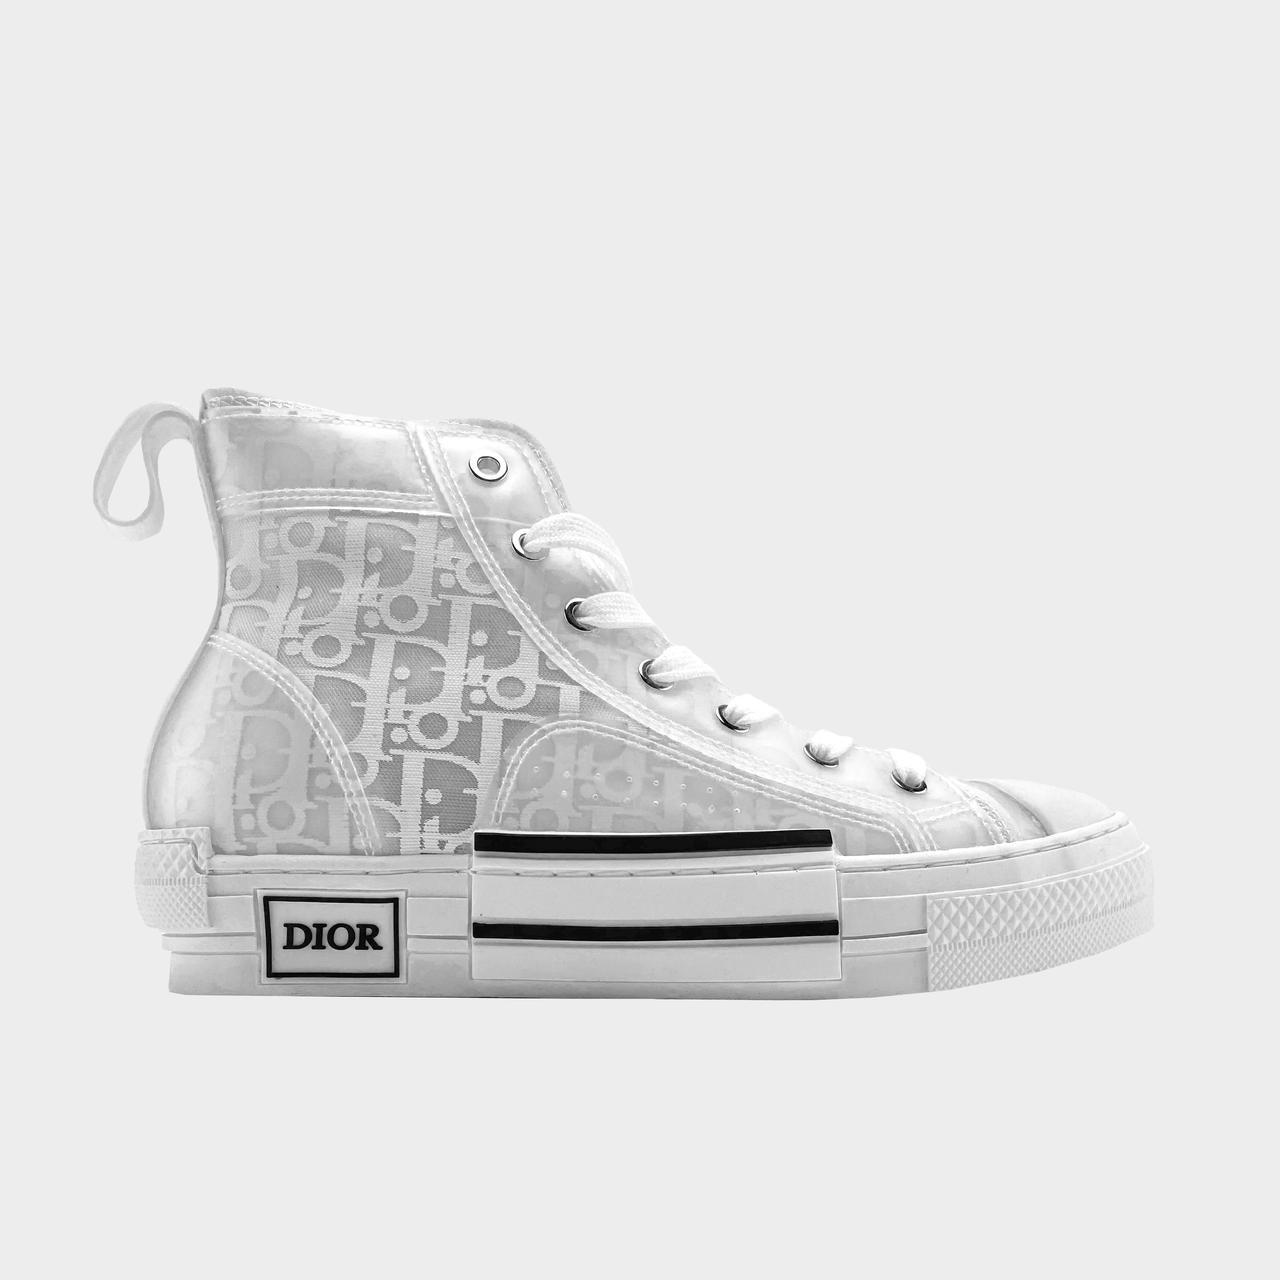 Кроссовки женские Dior B23 High-Top Silver White (Белый). Женские кроссовки Диор белого цвета.